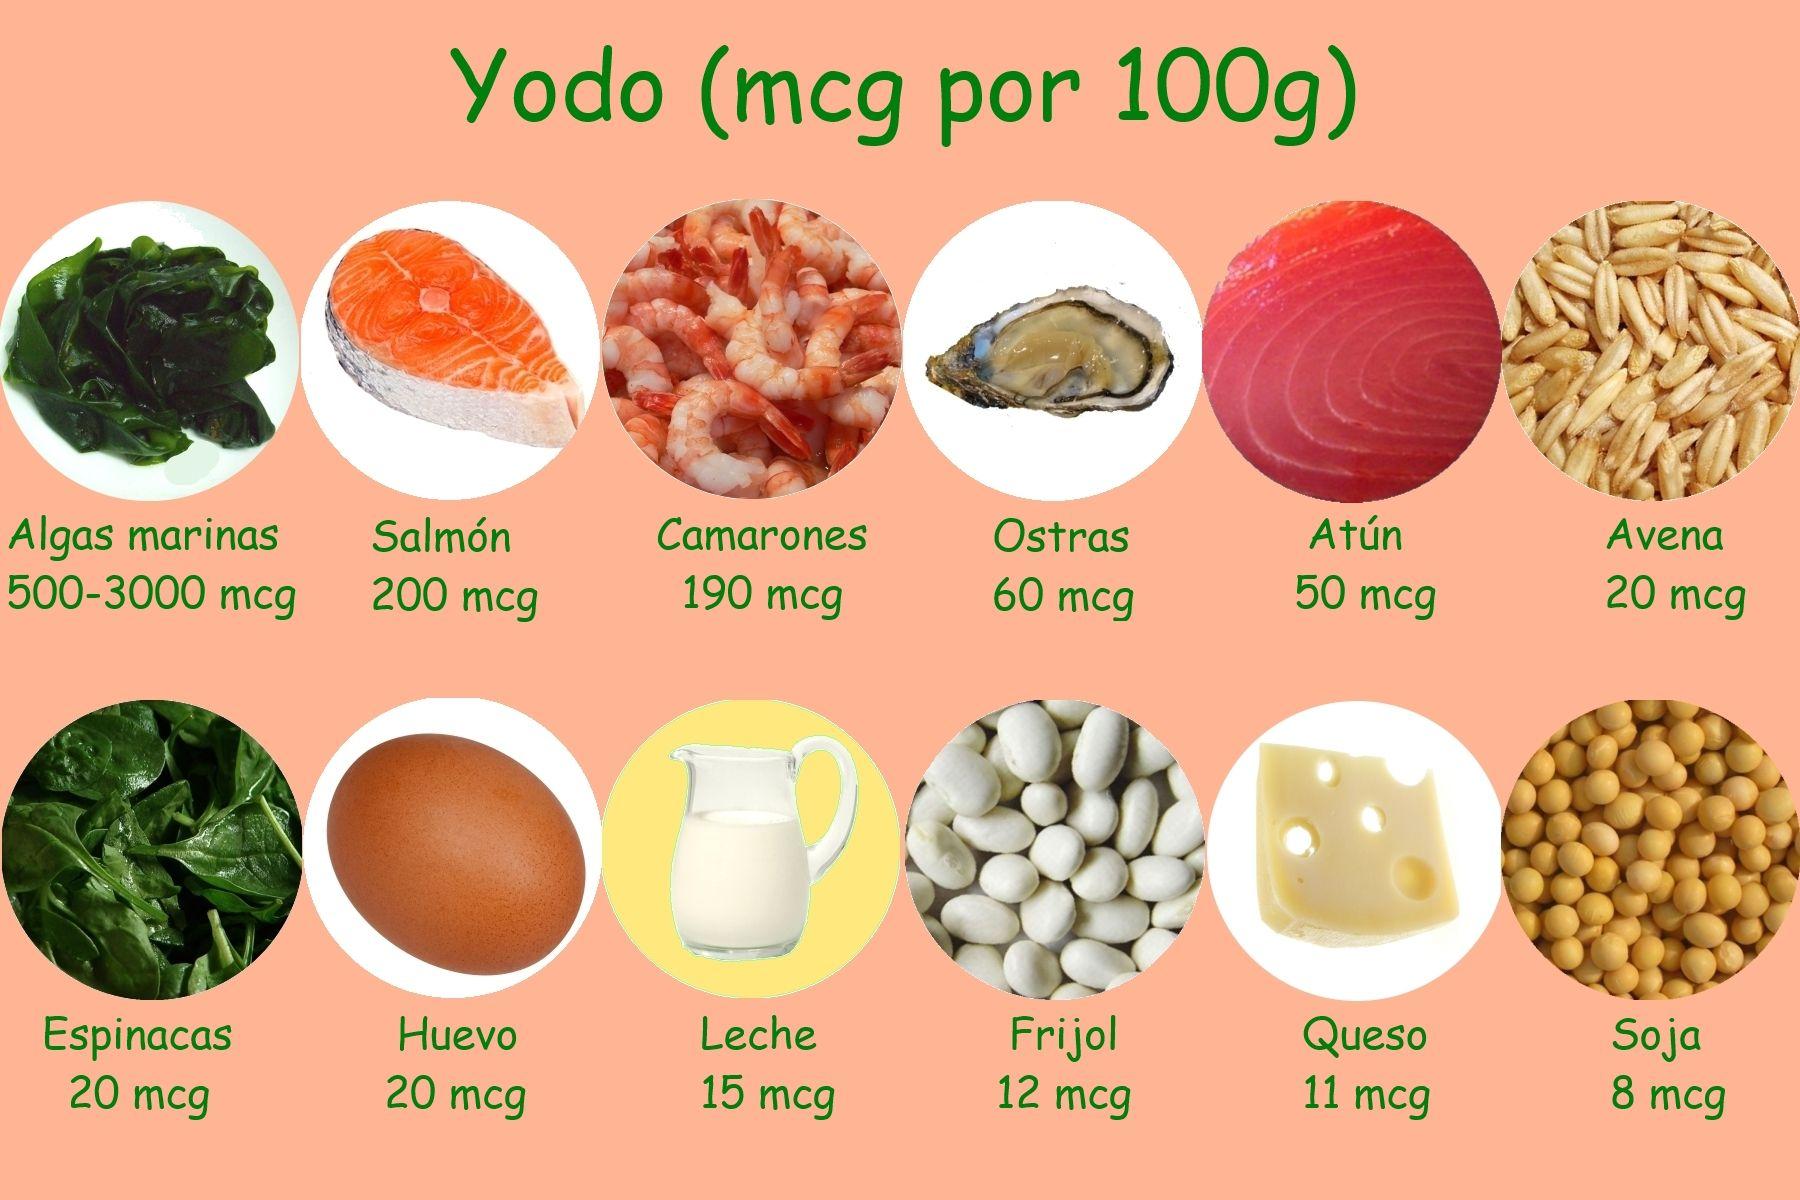 Alimentos ricos en hierro buscar con google alimentos q contienen hierro pinterest - Alimentos q contienen vitamina b ...